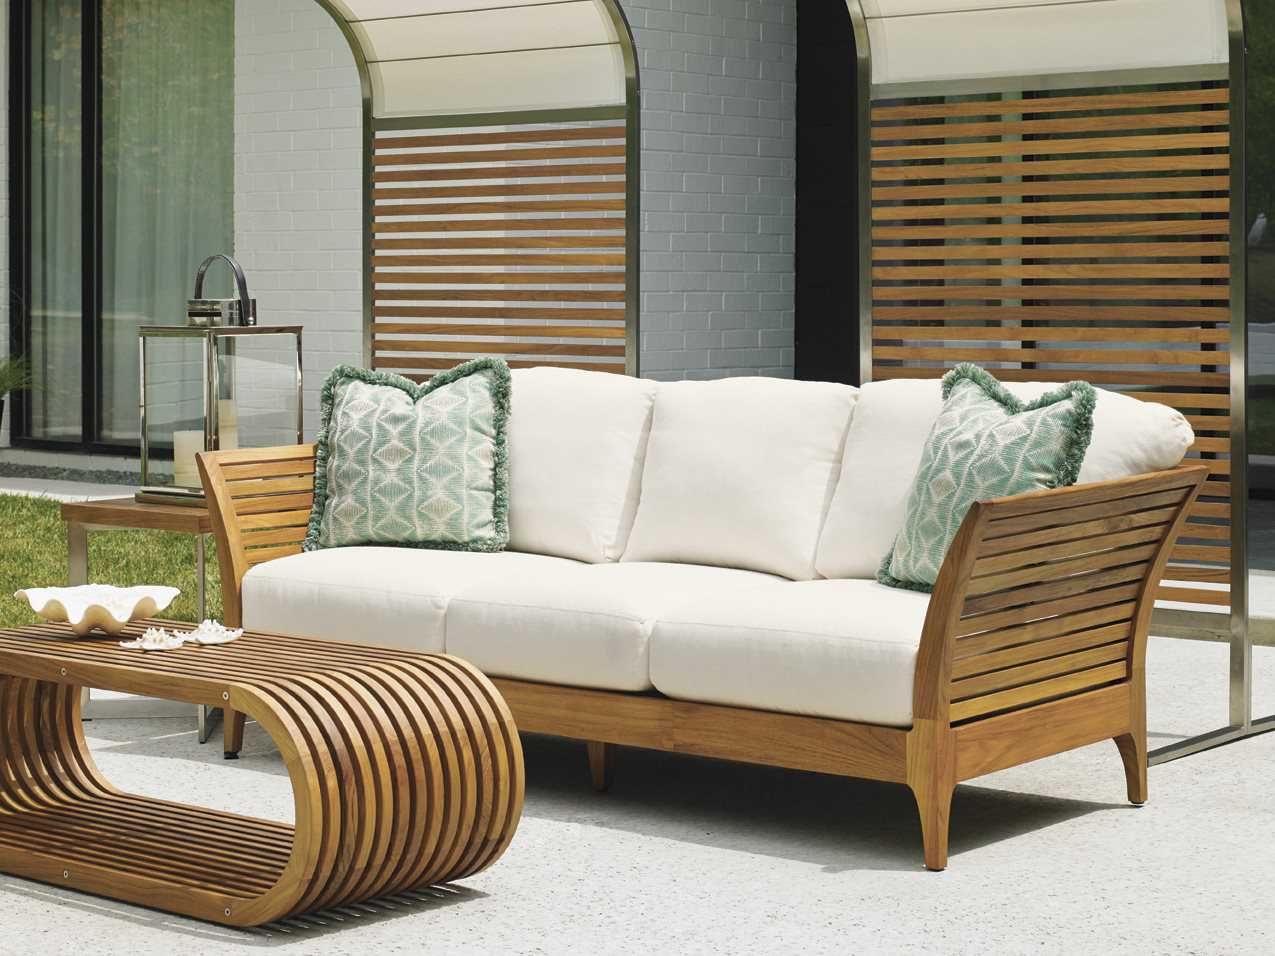 chic sofa set brown sofas decor tommy bahama outdoor tres teak cushion 3401 33